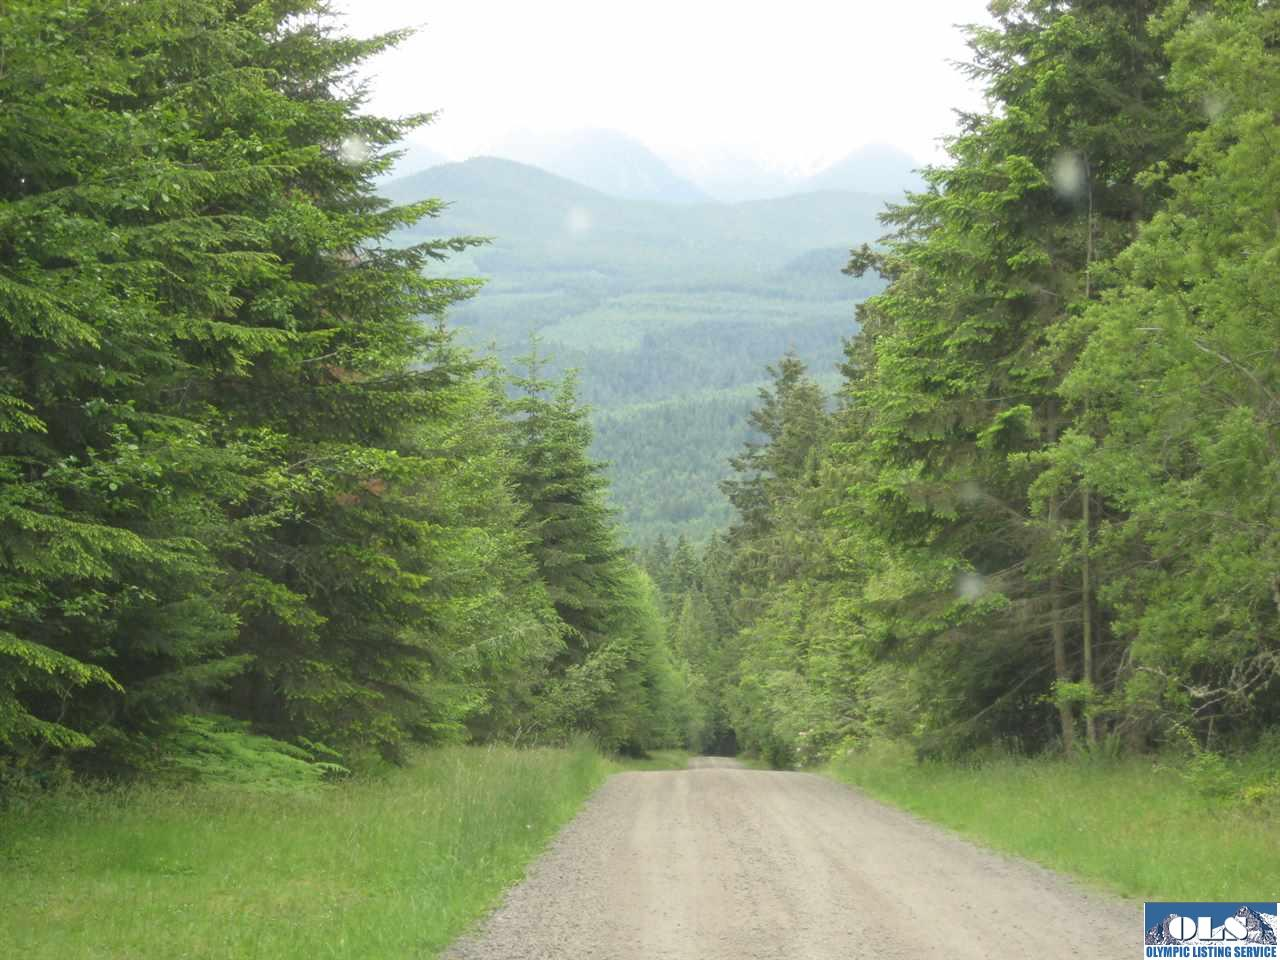 NKA Lost Mountain Lane, Sequim, WA 98382